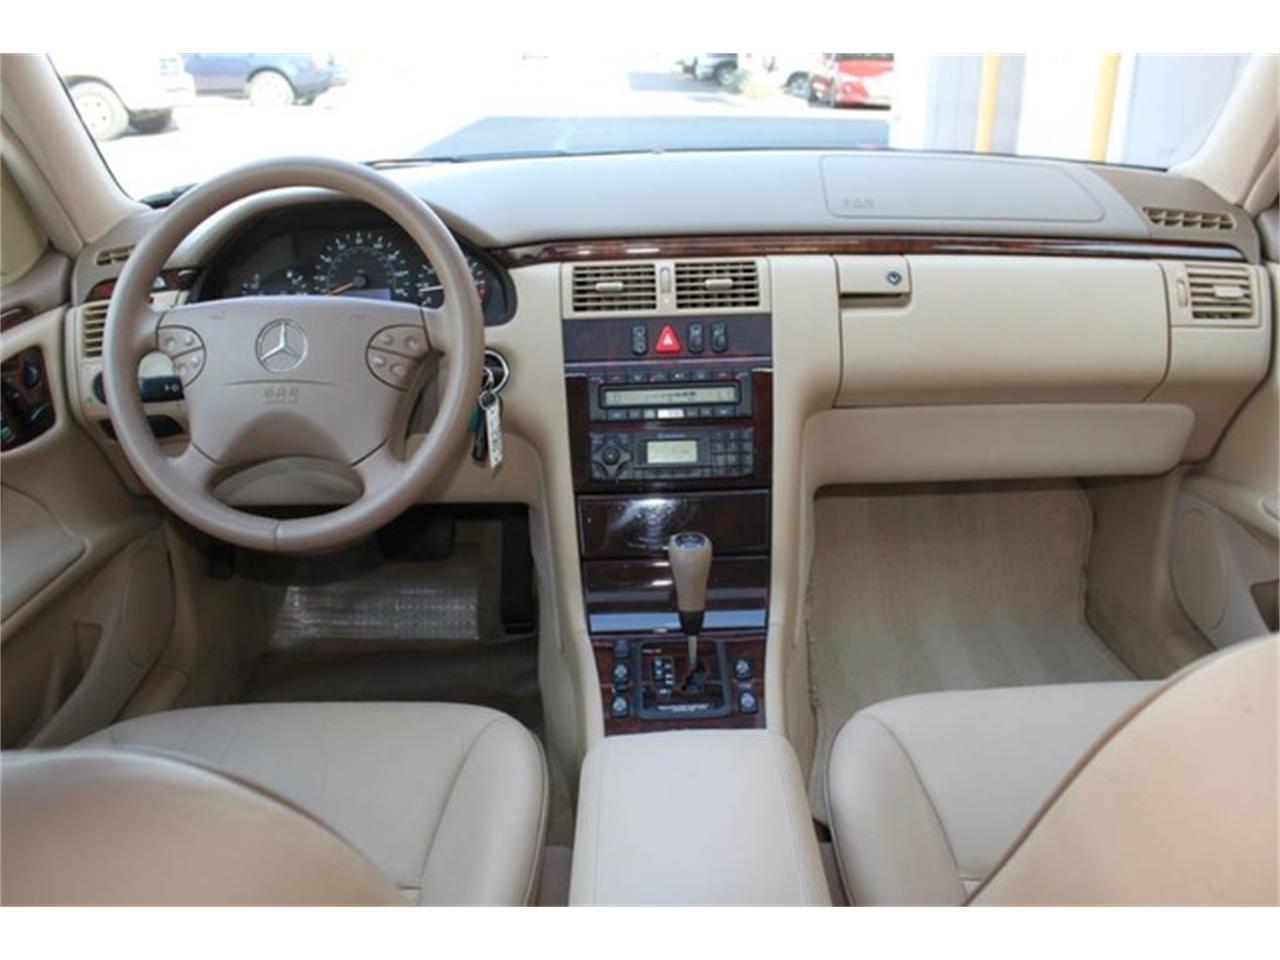 2000 Mercedes-Benz E-Class (CC-1330039) for sale in Scottsdale, Arizona